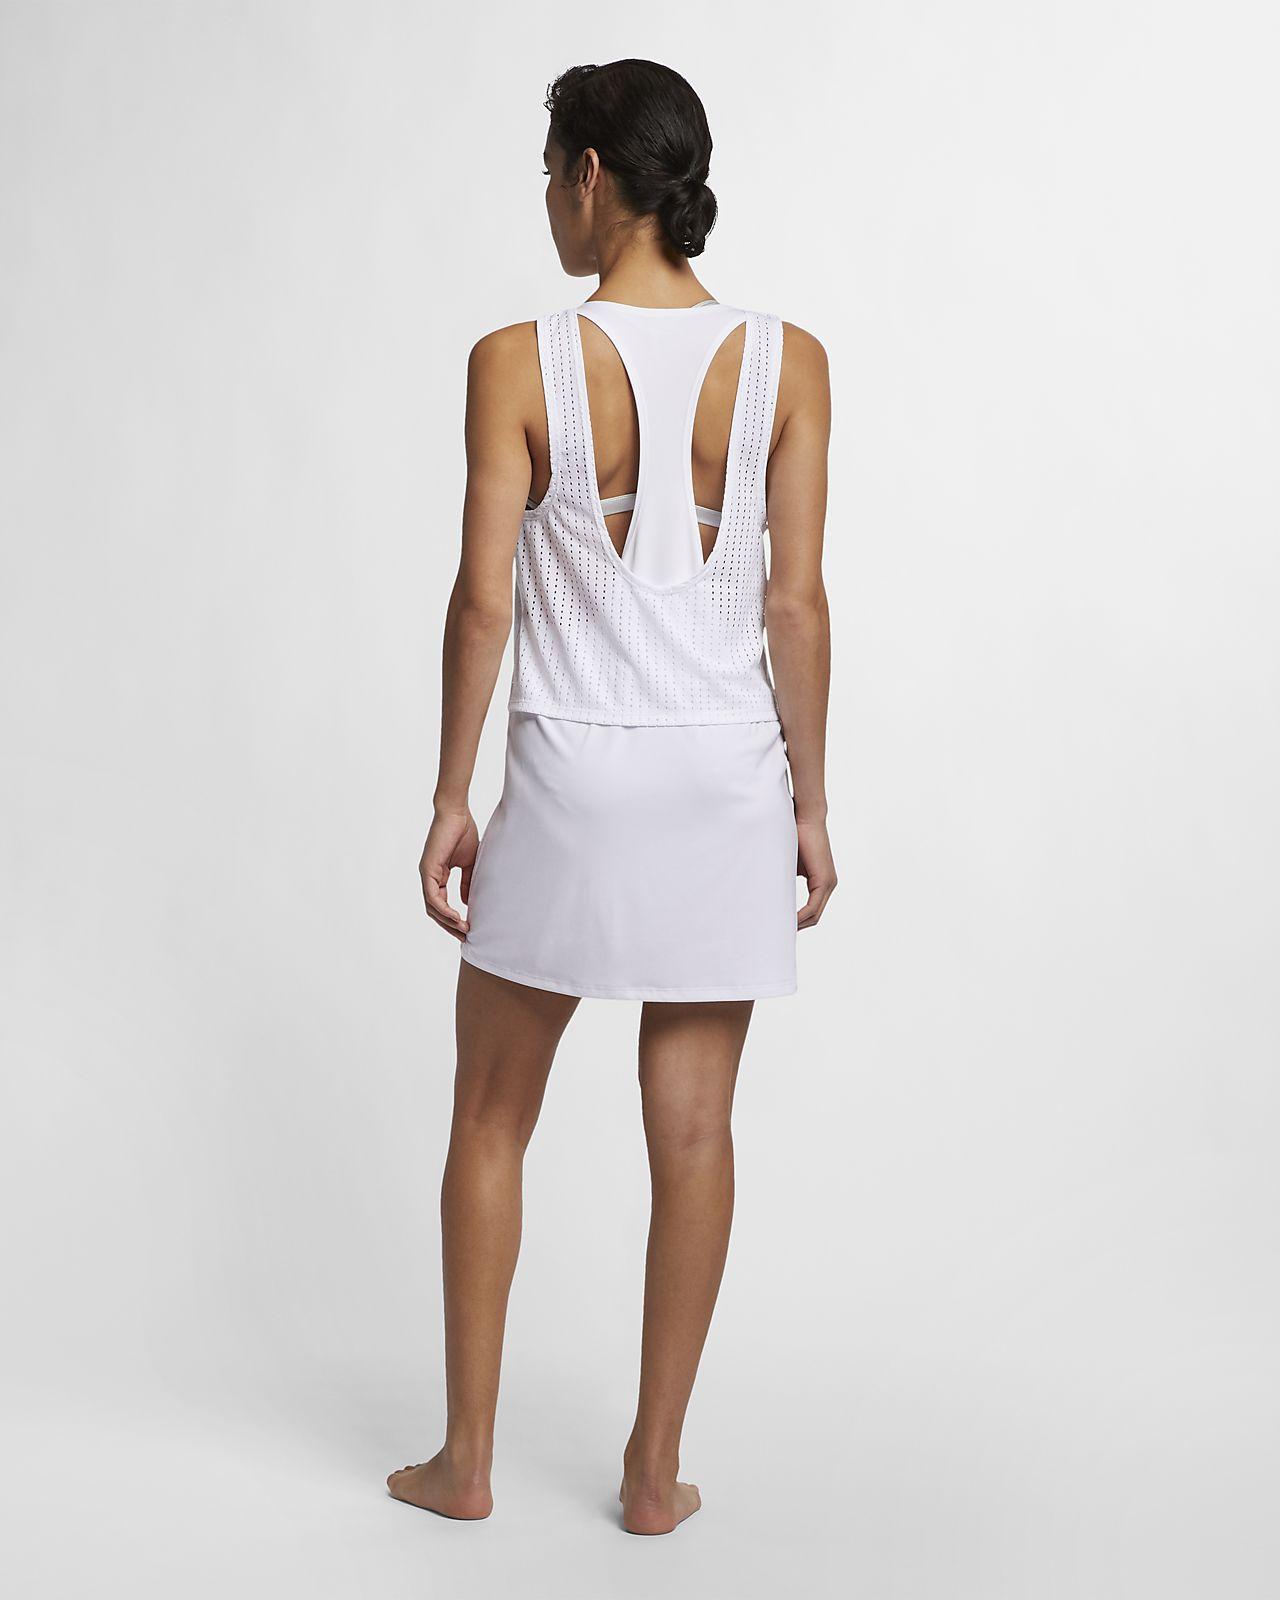 10472e7ee81 Nike Sport Mesh Cover-Up Women's Reversible Layered Dress. Nike.com